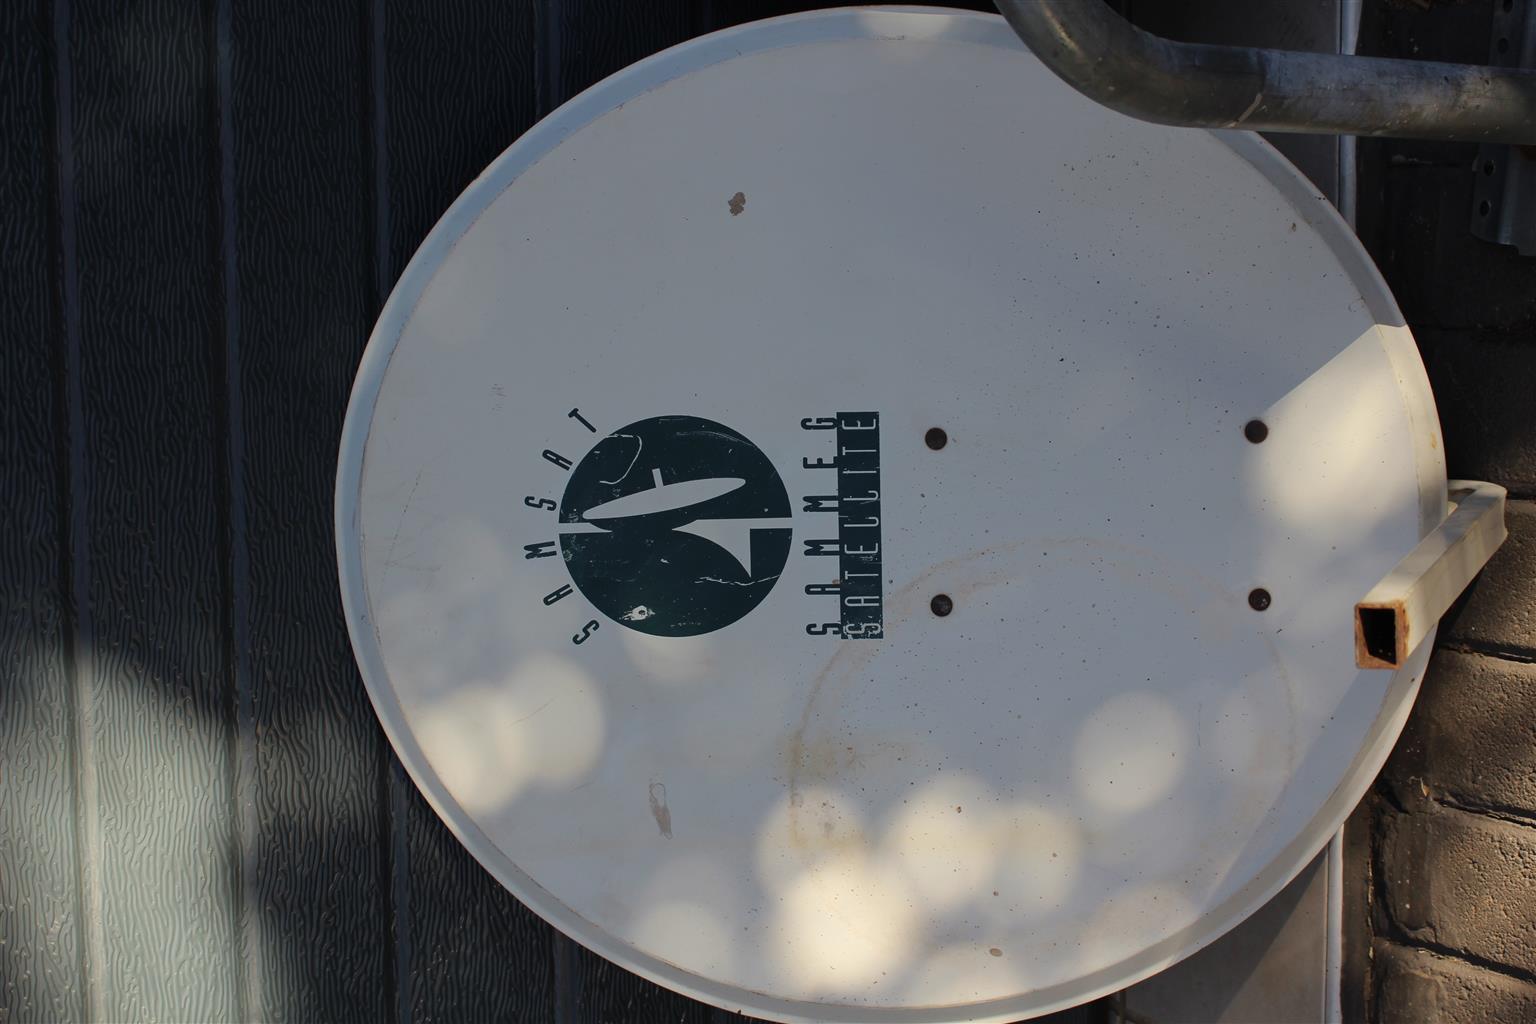 Satellite Dishes New & Used DSTV, Elsat, Samsat, SkyWave Starwalker 0,700 to 1m size